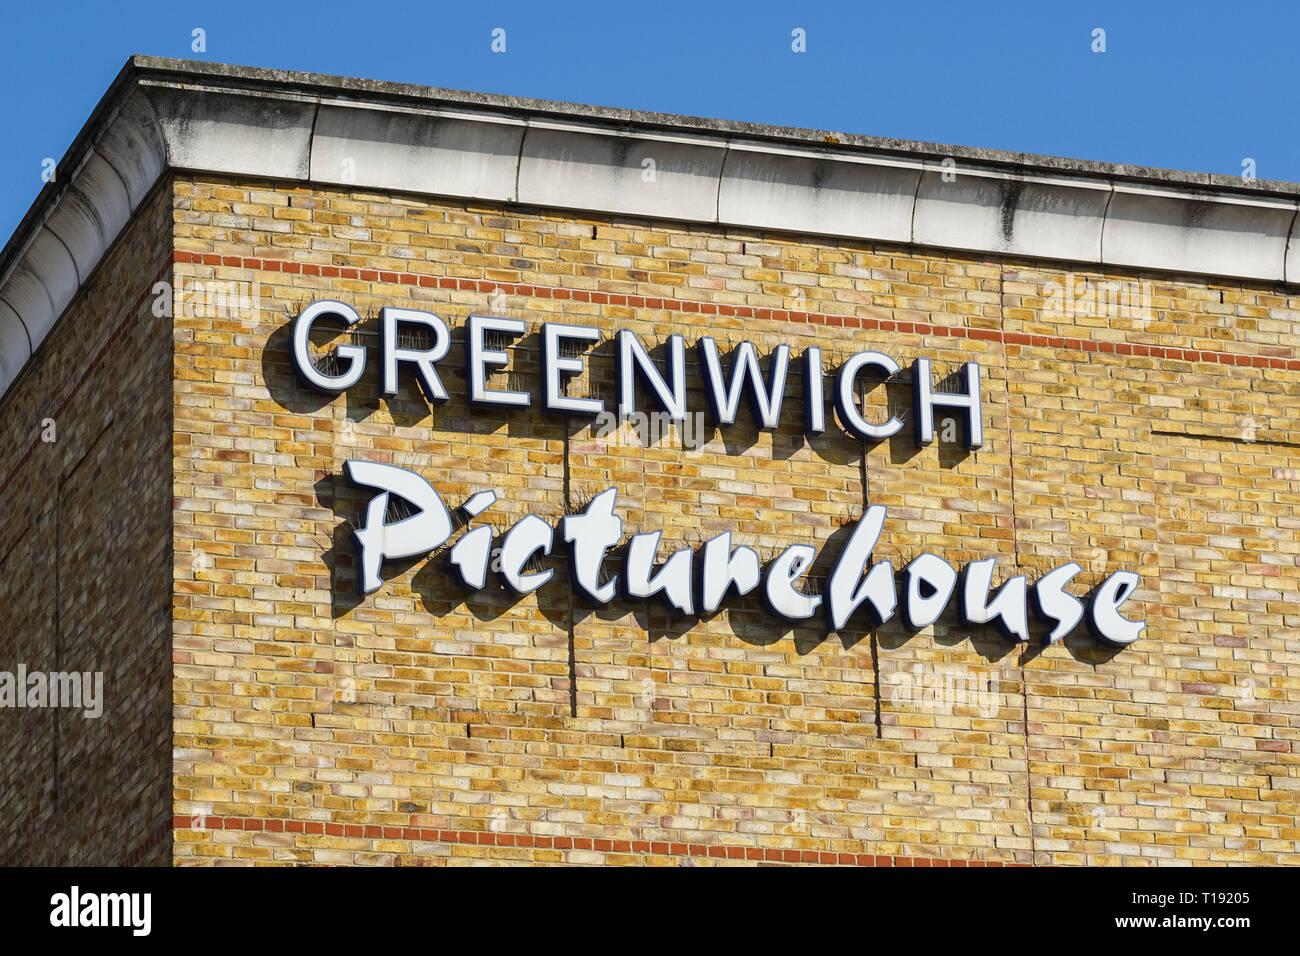 Greenwich Picturehouse, London England United Kingdom UK - Stock Image